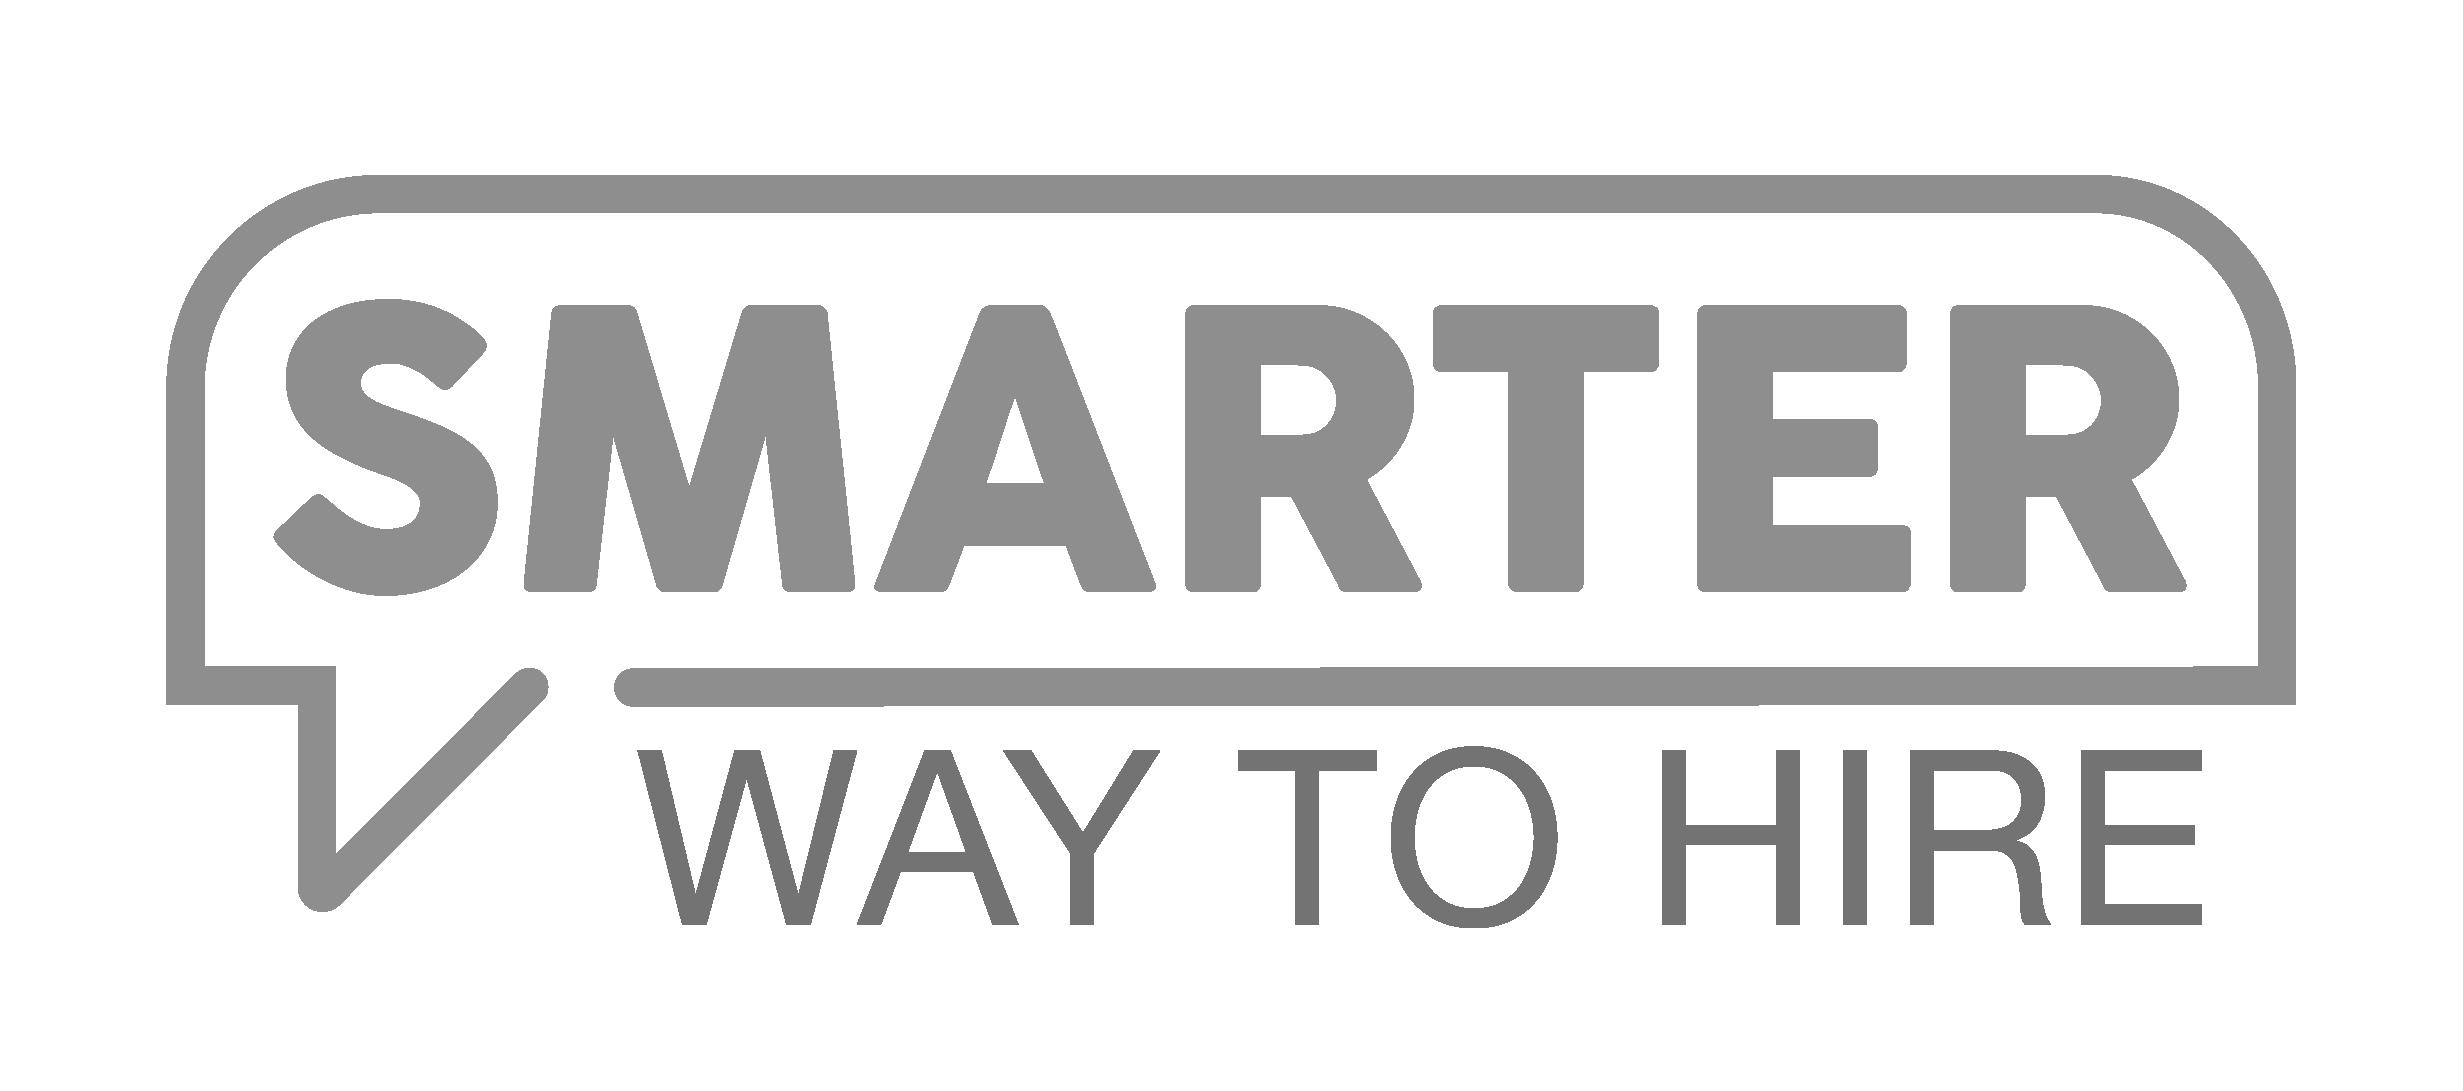 Smarter Way to Hire Company Logo